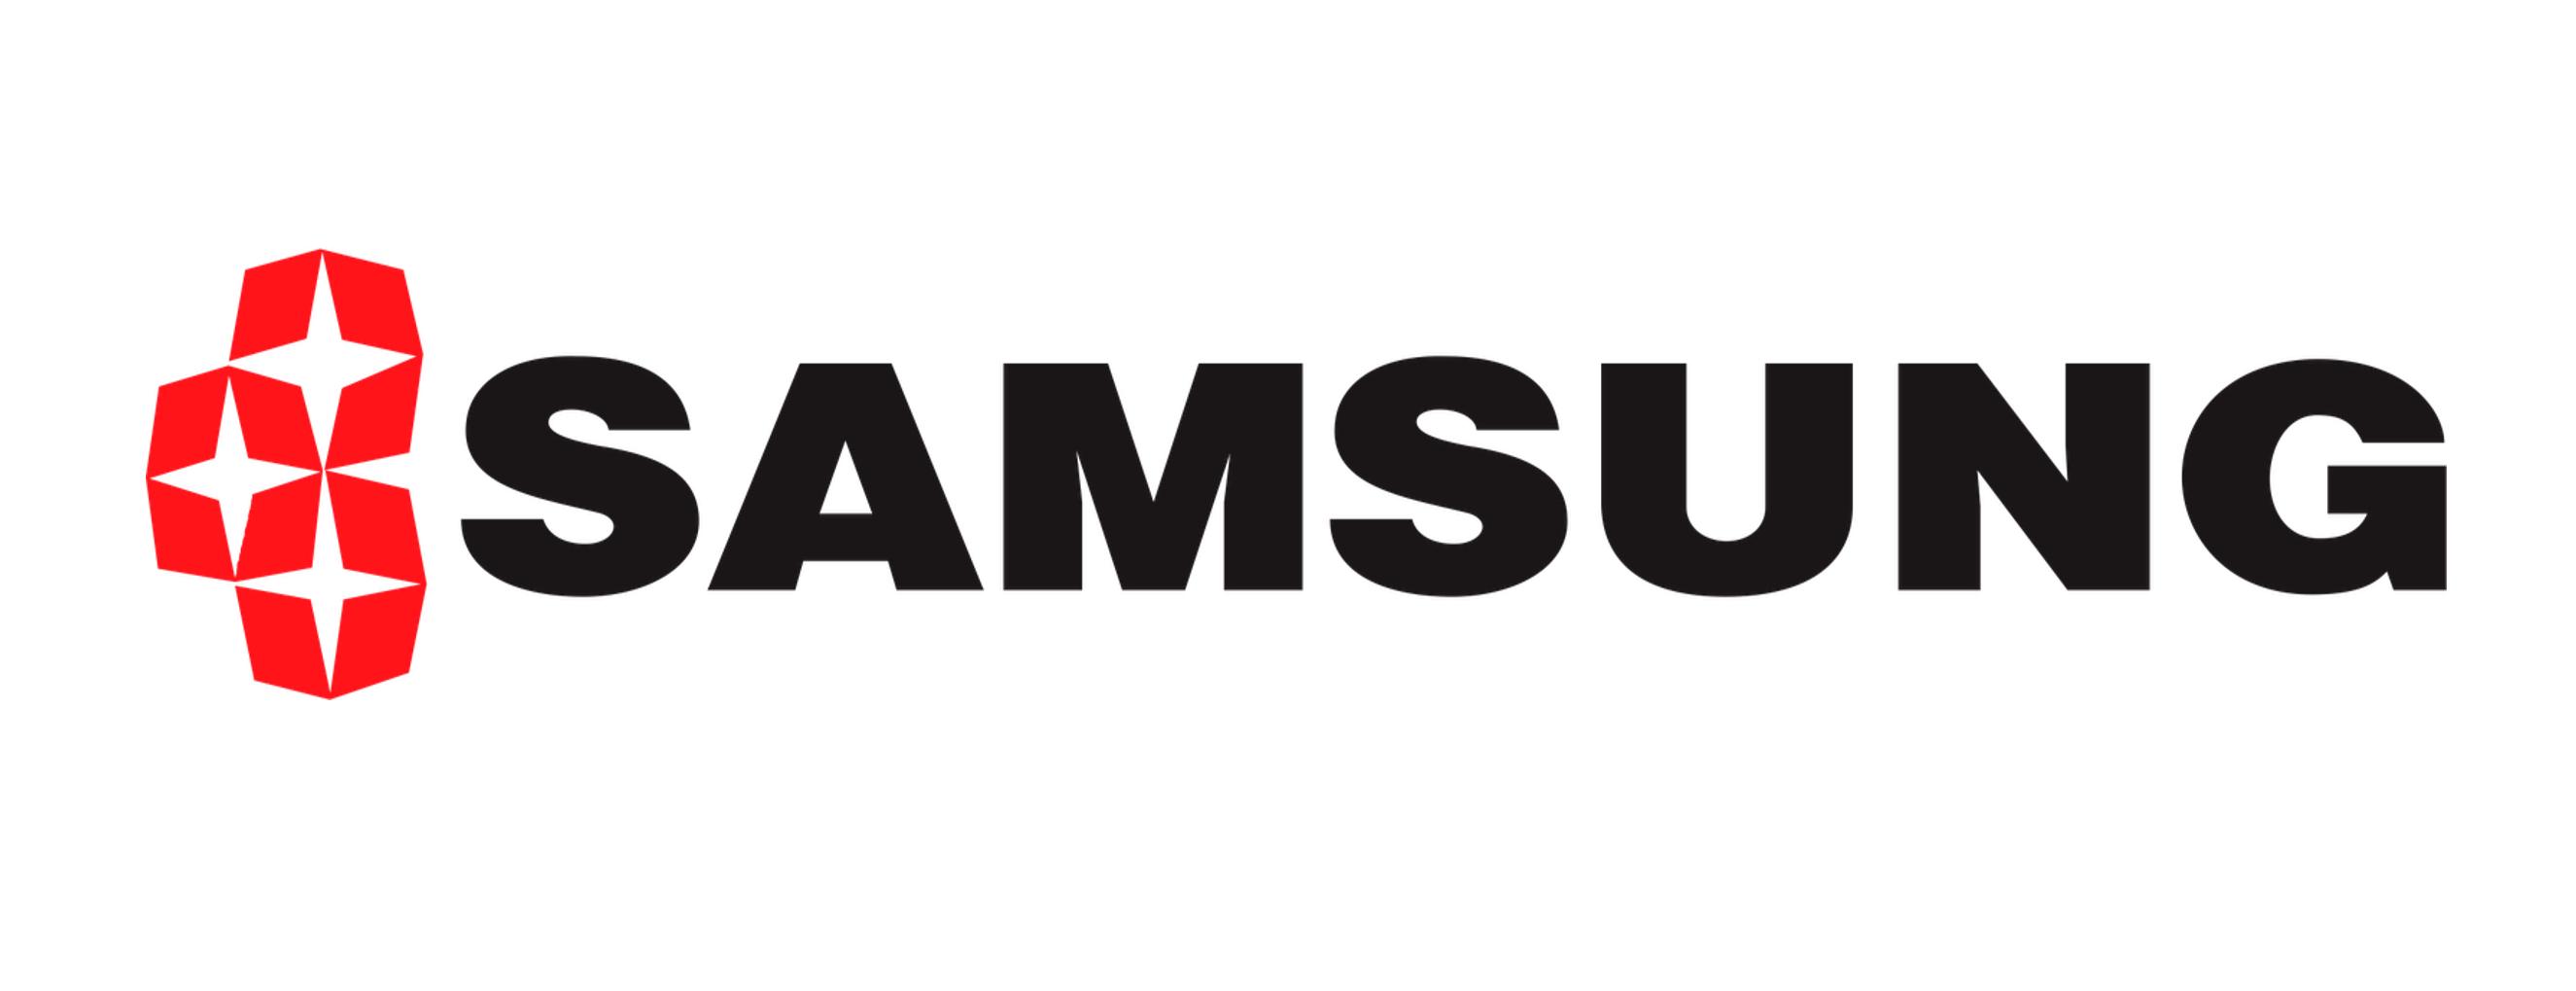 Origin South Korea Foundation January 13 1969 Owner Of The Brand Samsung Electronics Co Ltd Sect Appliance Logo Appliances Logo Design Miele Appliances